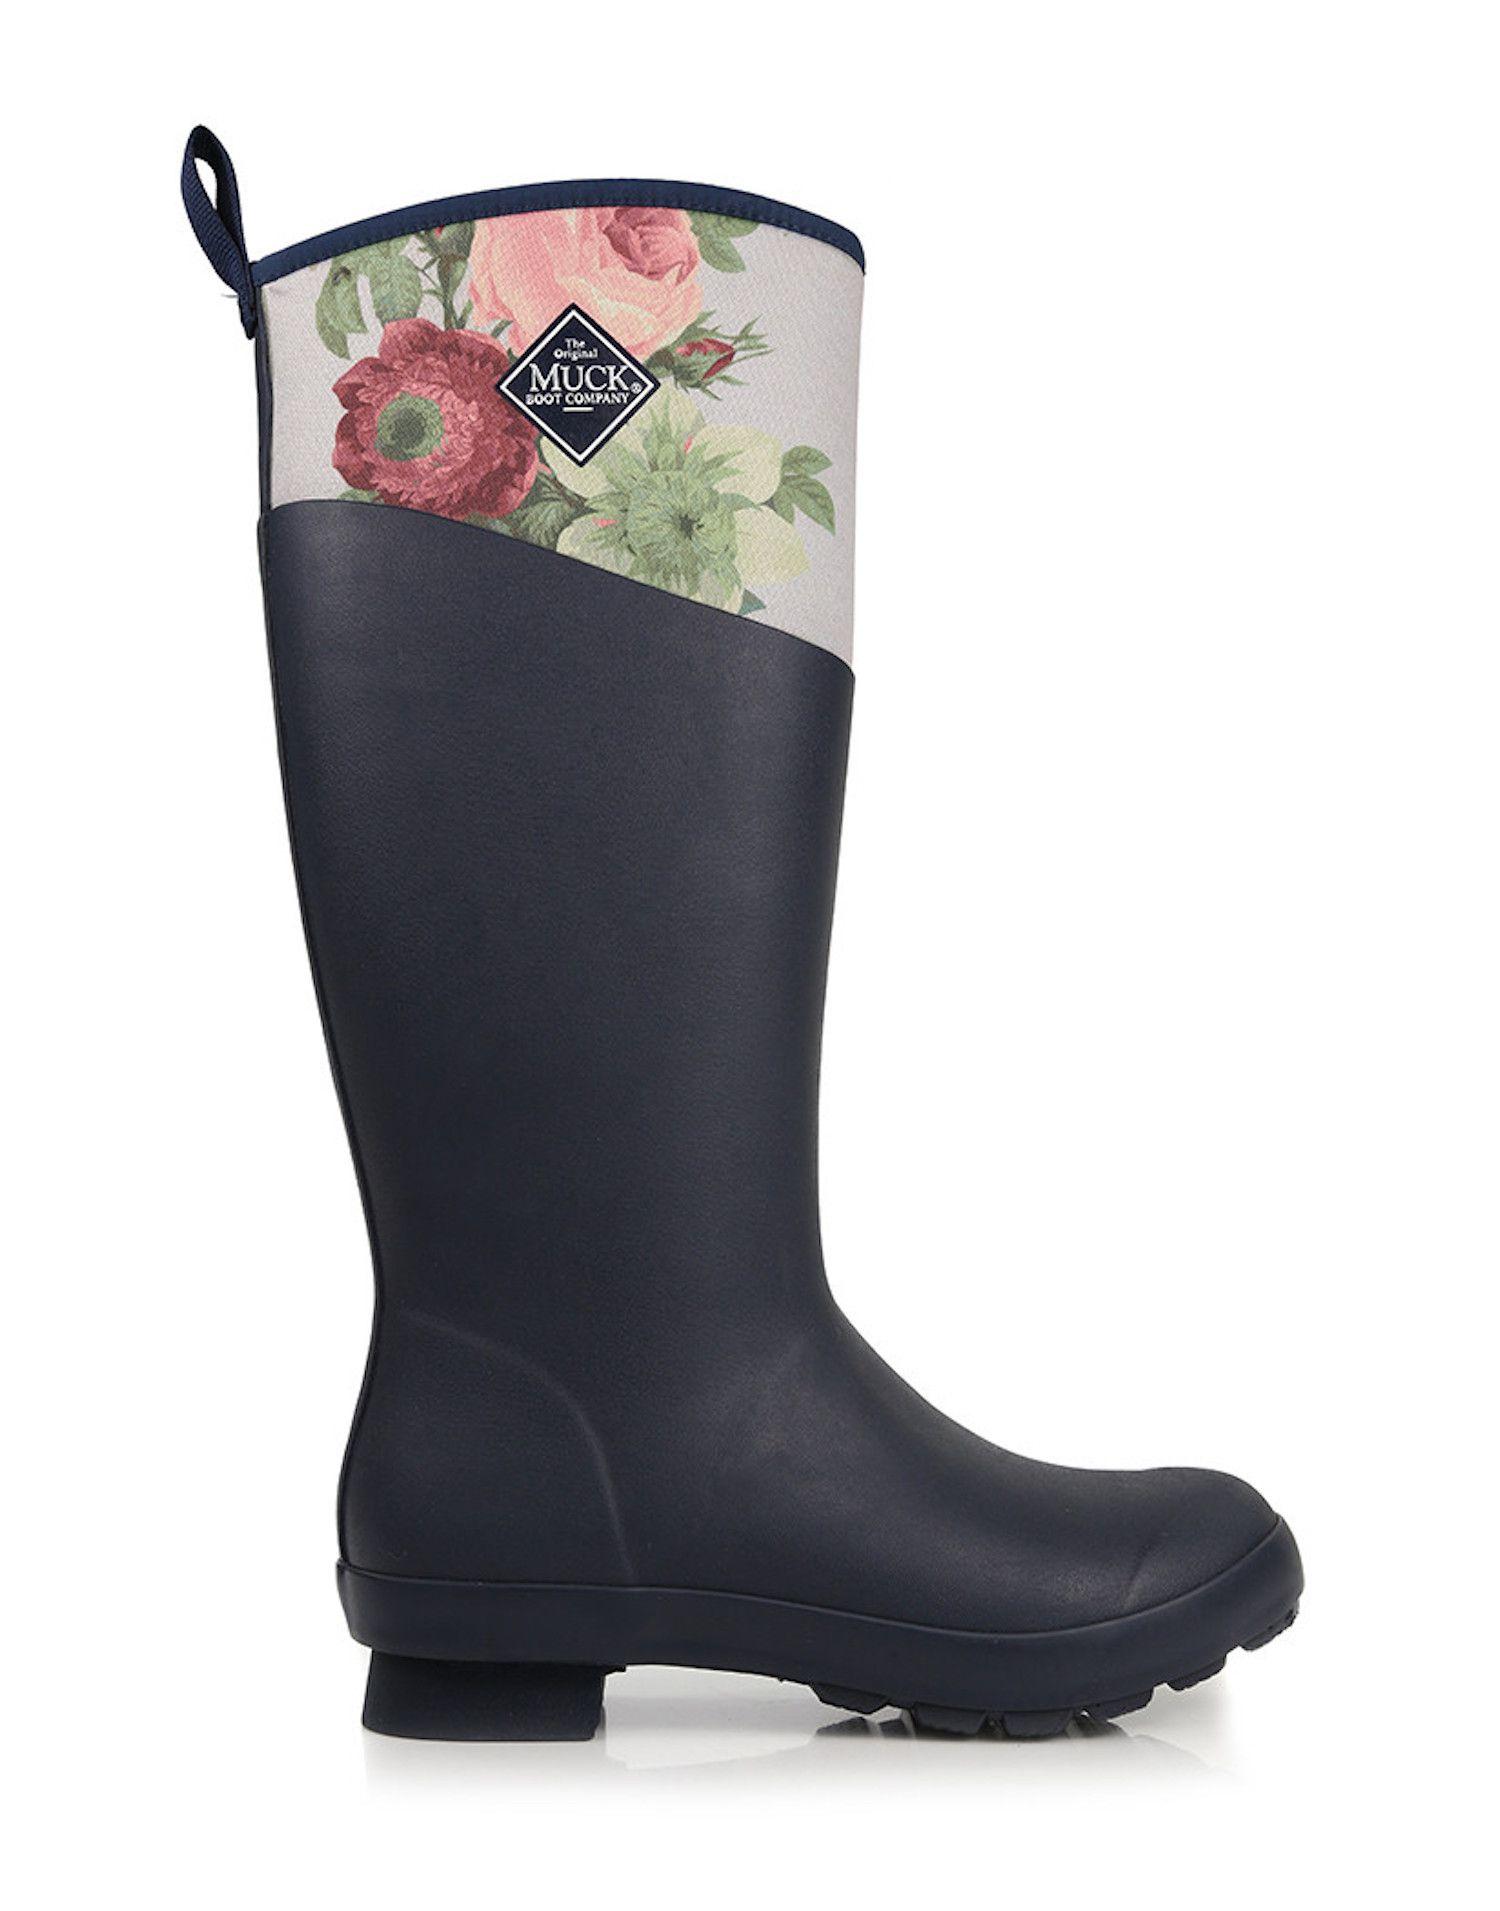 Muck Boot RHS Womens Tremont RHS Print Waterproof Welly photo